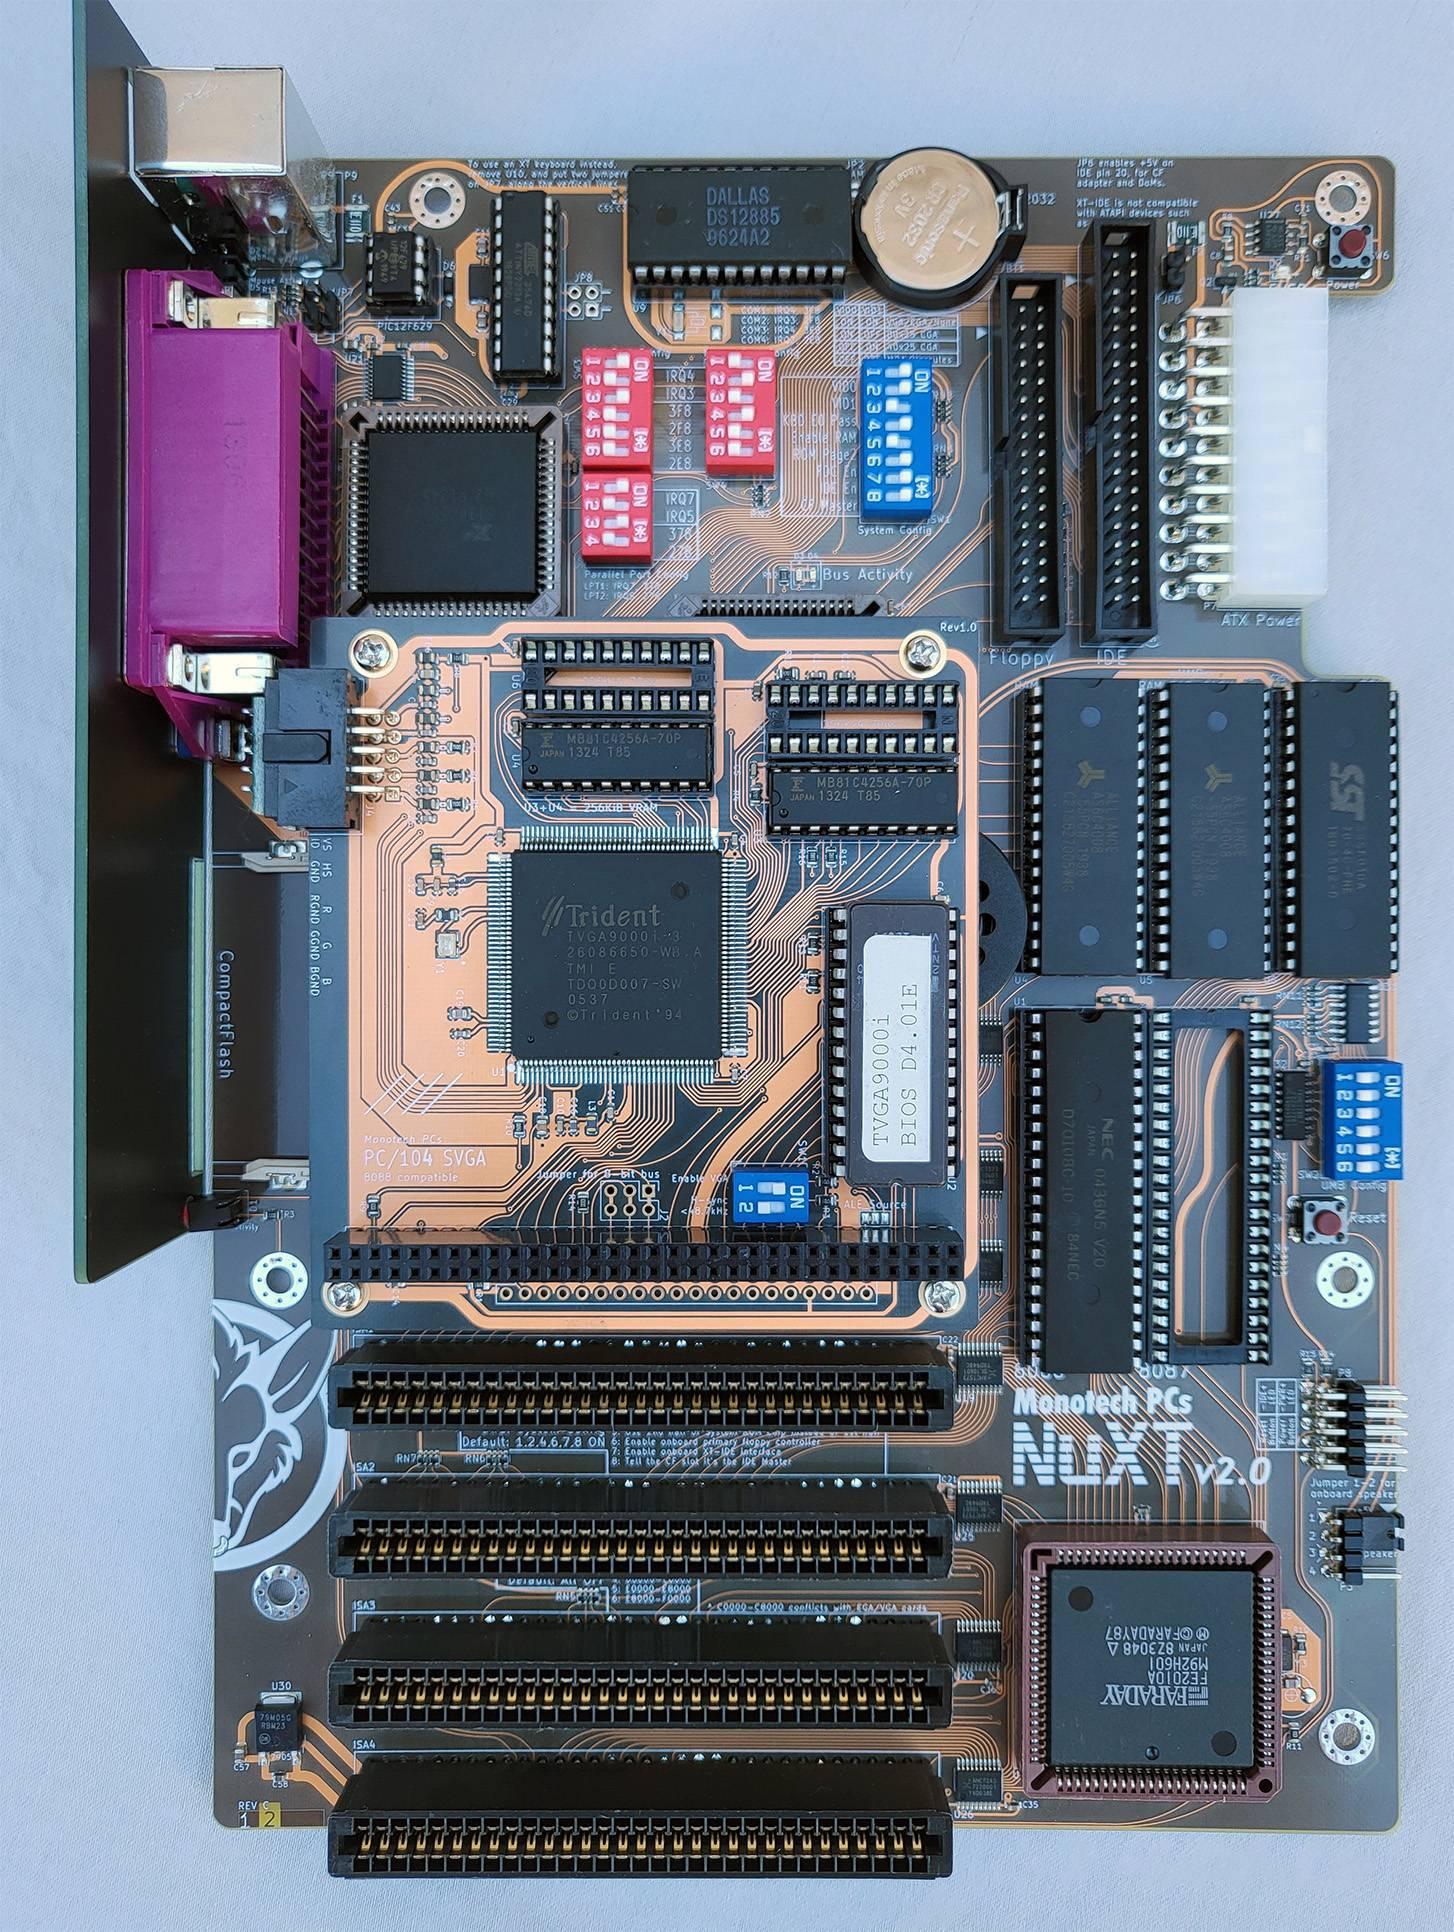 NuXT v2.0 - MicroATX Turbo XT - 10MHz, 832K, XT-IDE, Multi-IO, SVGA